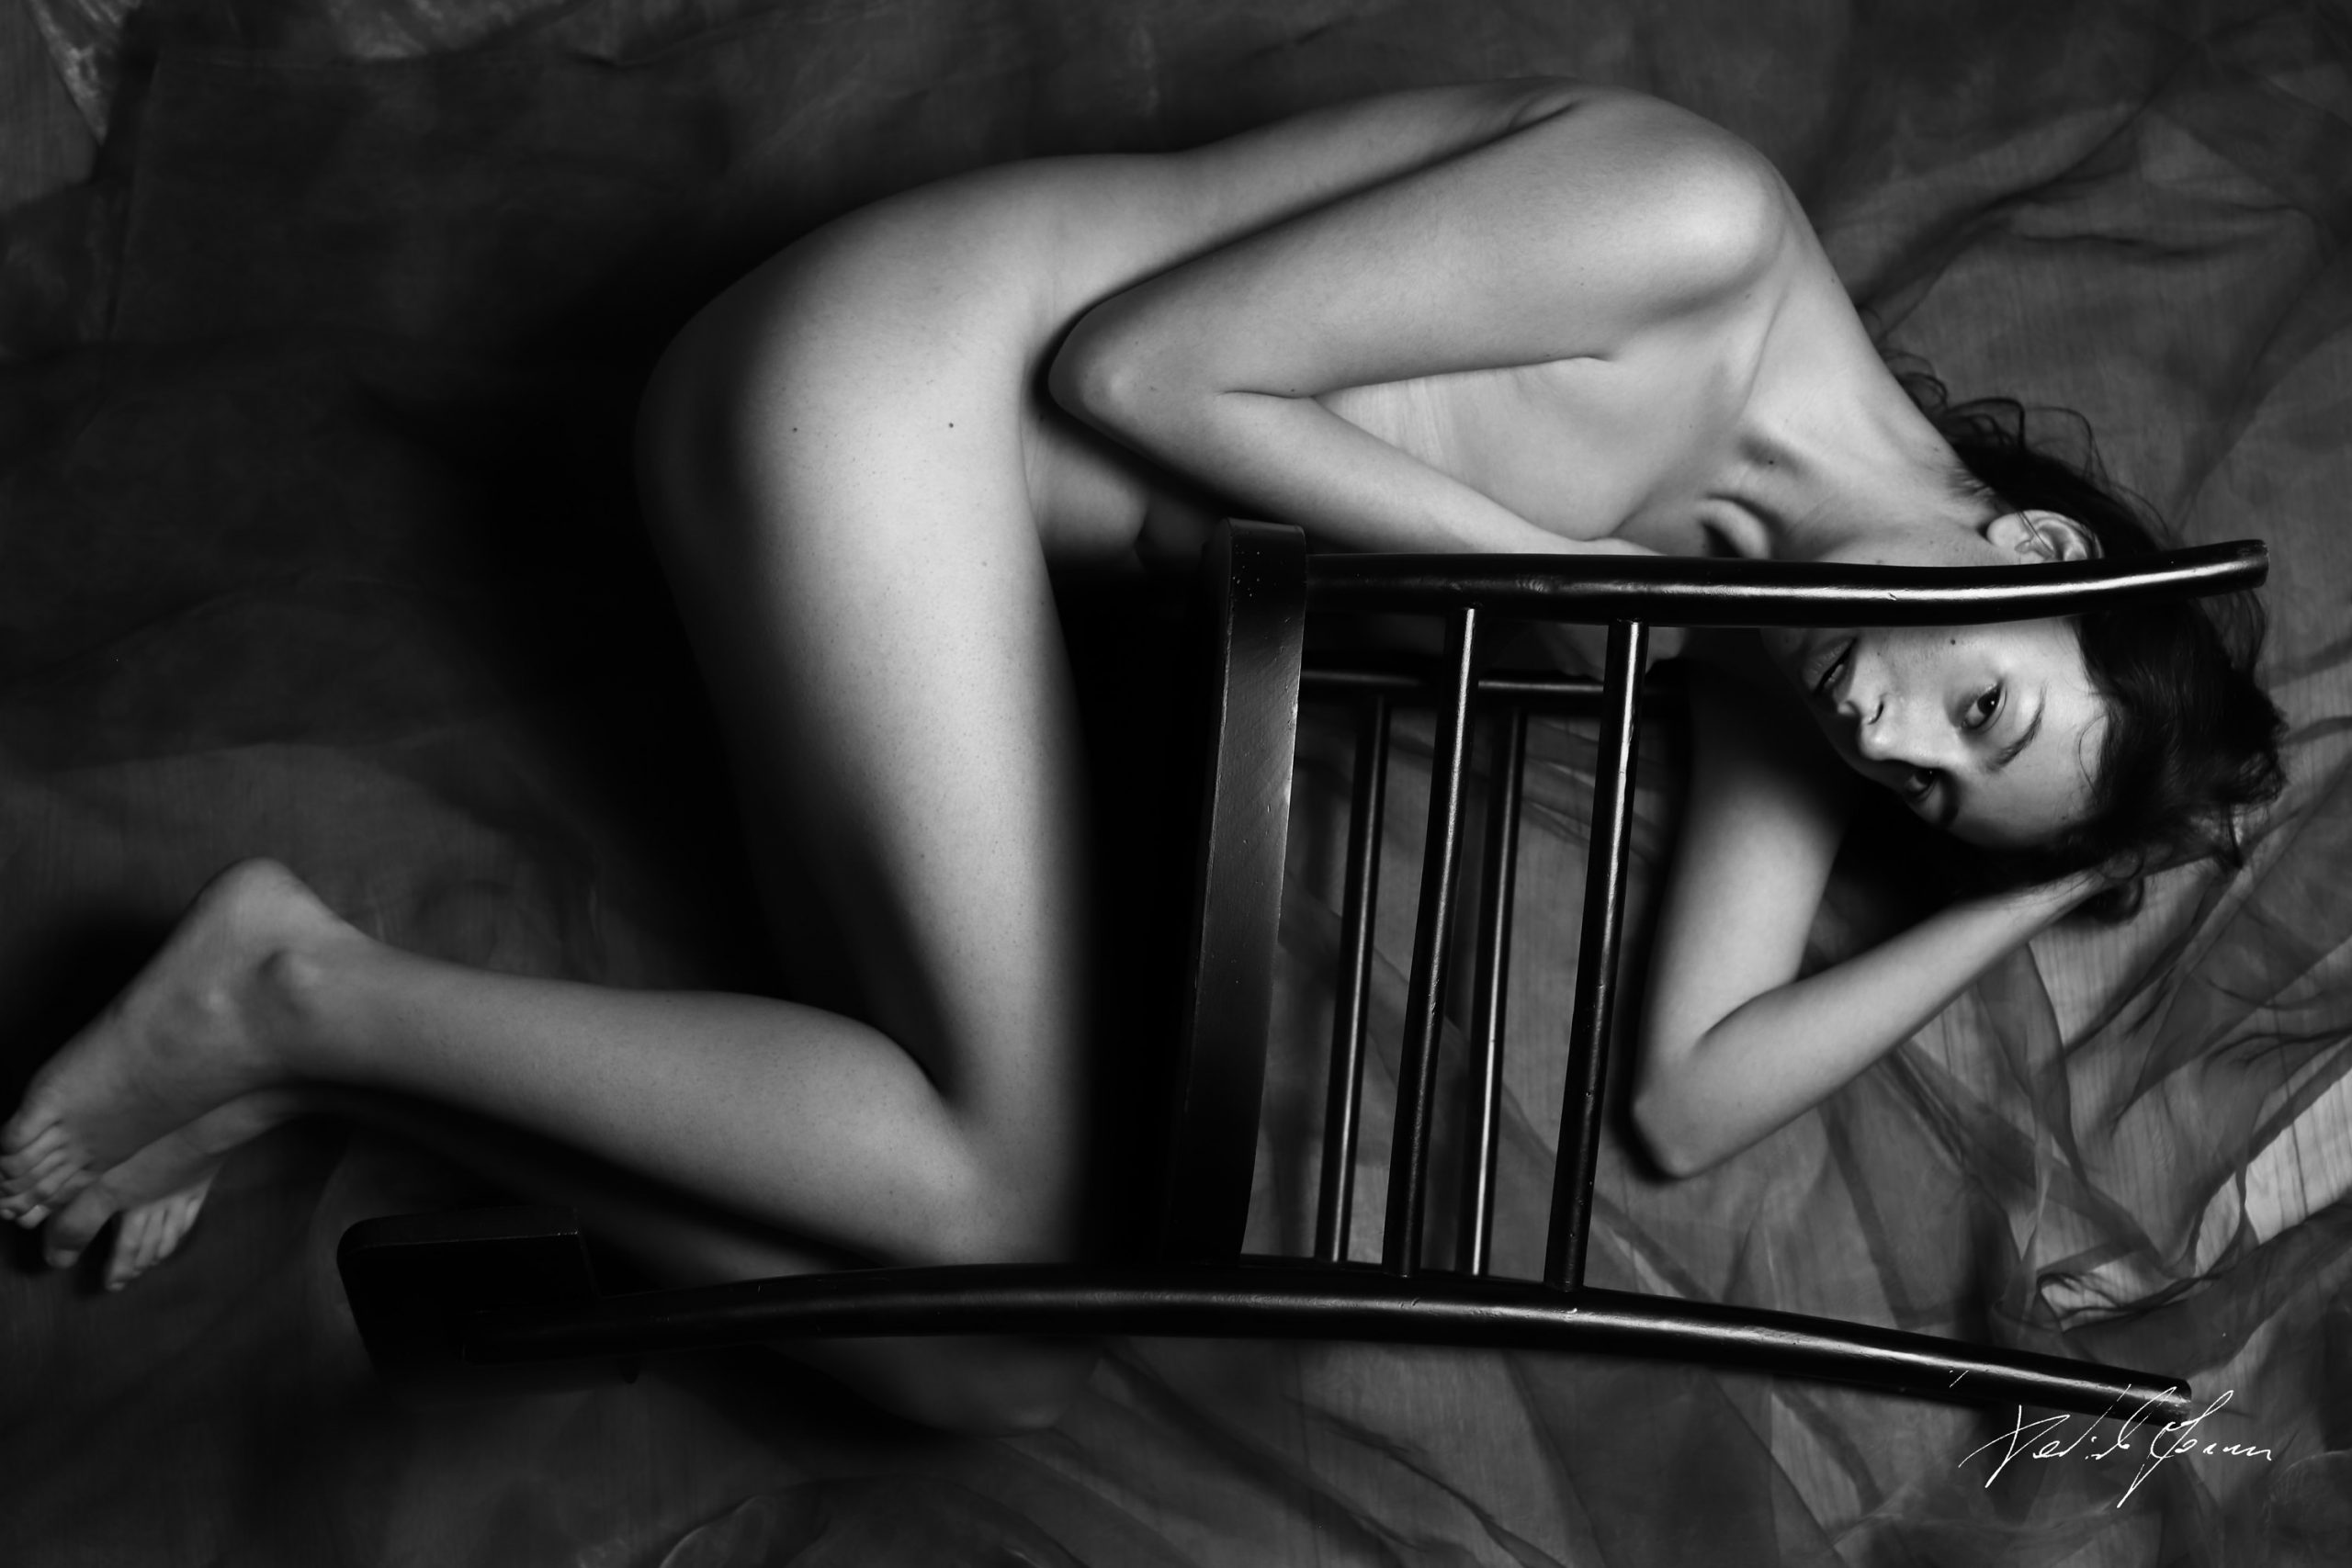 Categorie: Boudoir & Nude, Fine Art, Glamour, Portrait; Ph. DANIELE FORNER; Model: EMMA CESARANO; Location: Treviso (TV)